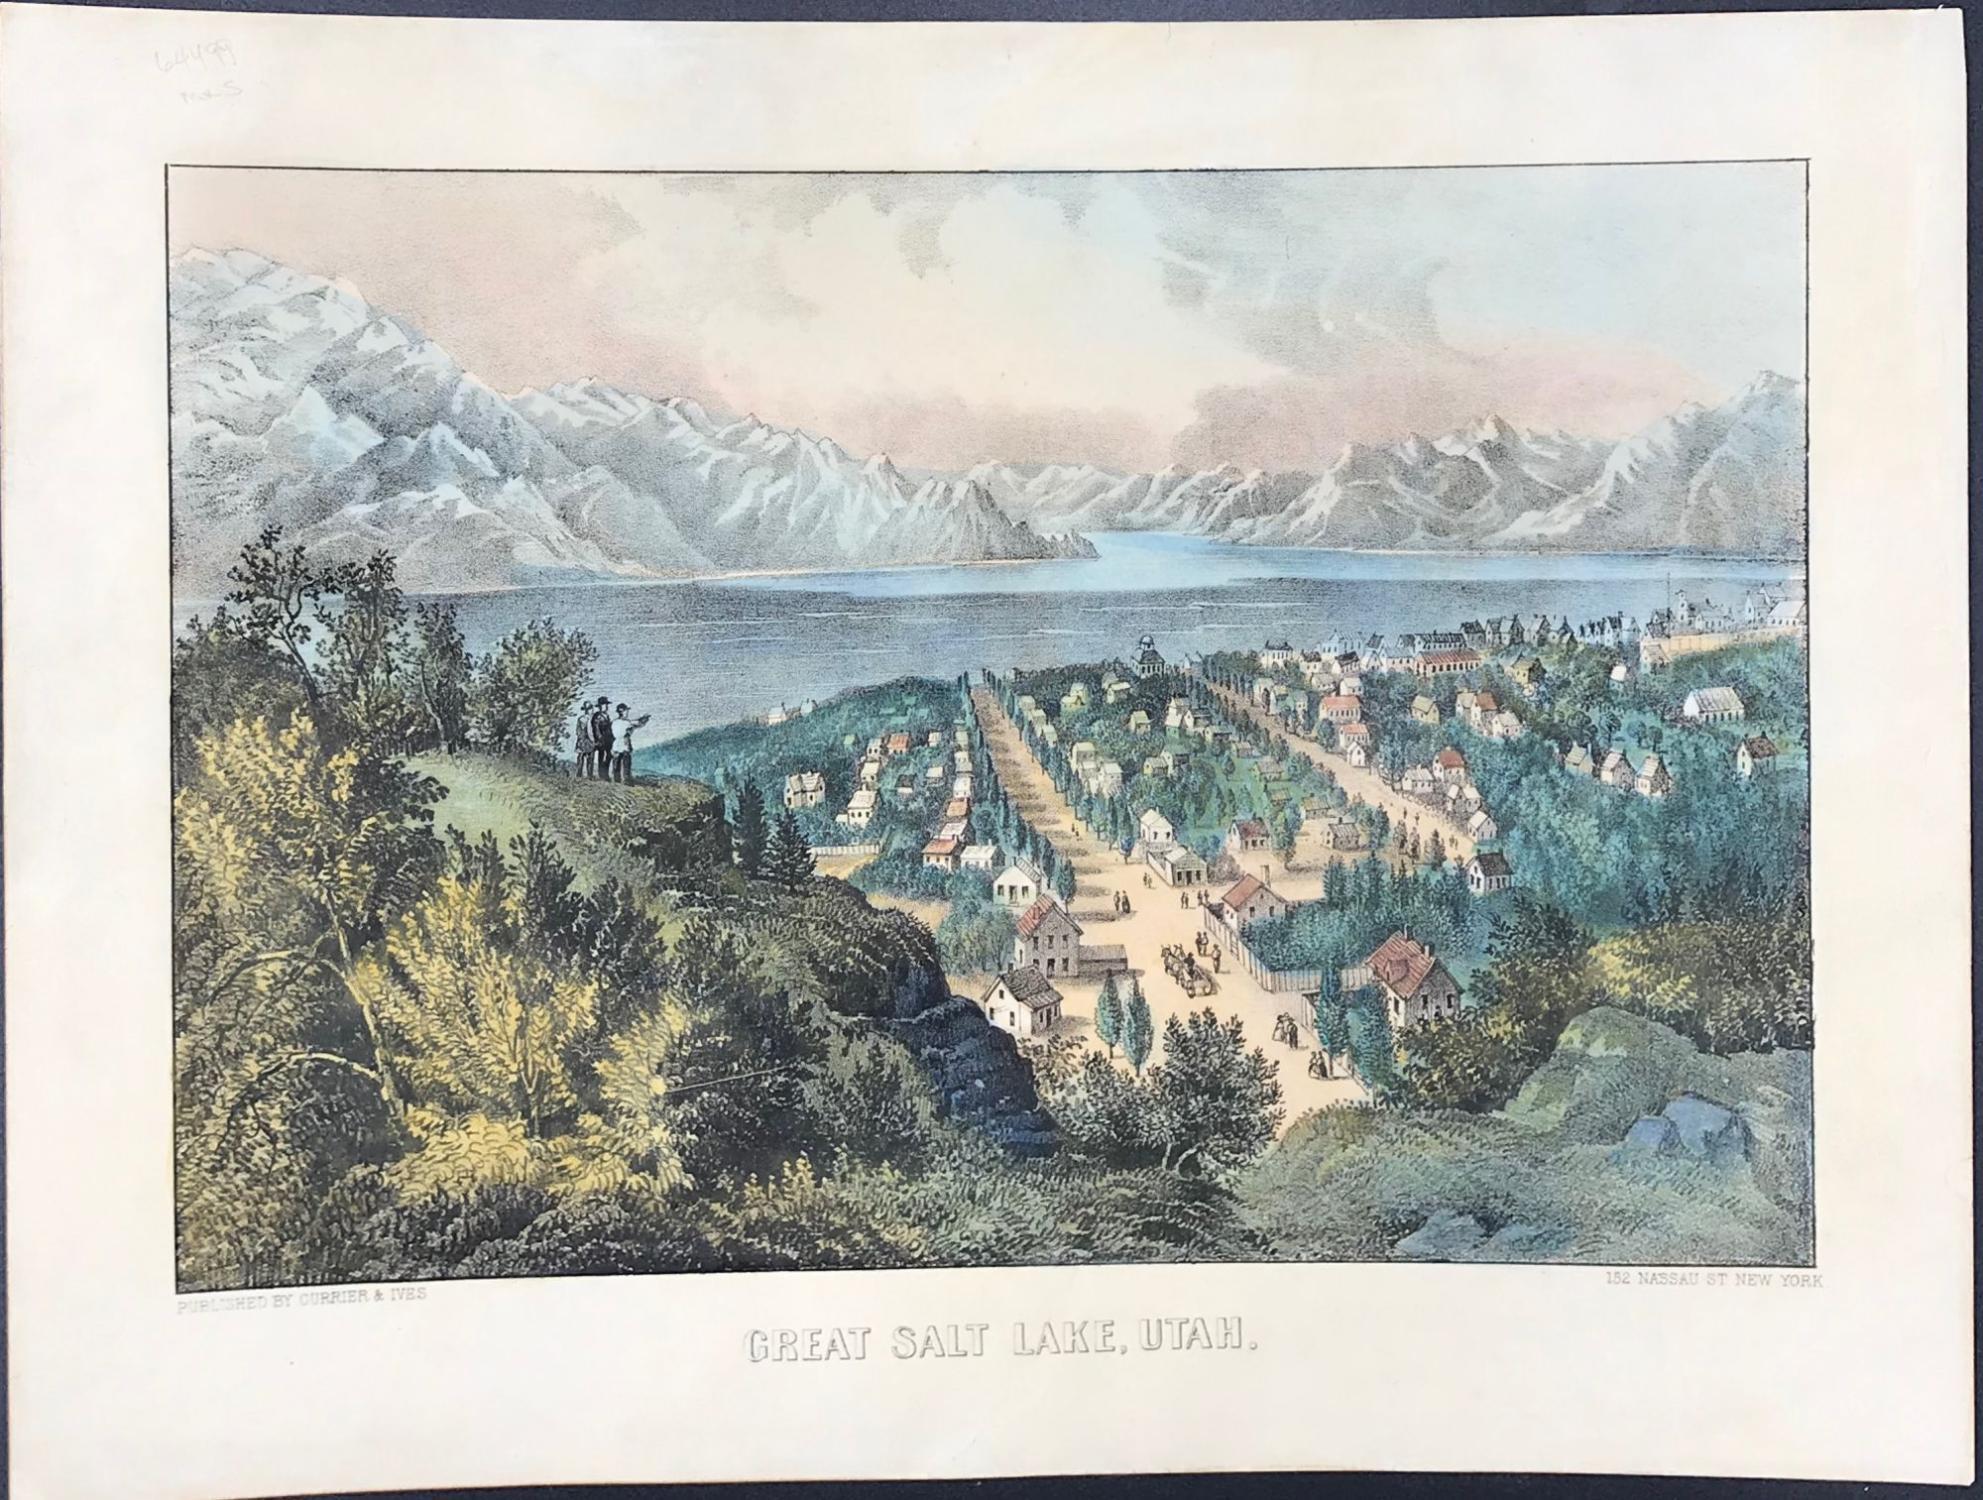 Contea Di Honolulu Hawaii vialibri ~ rare books from 1872 - page 4